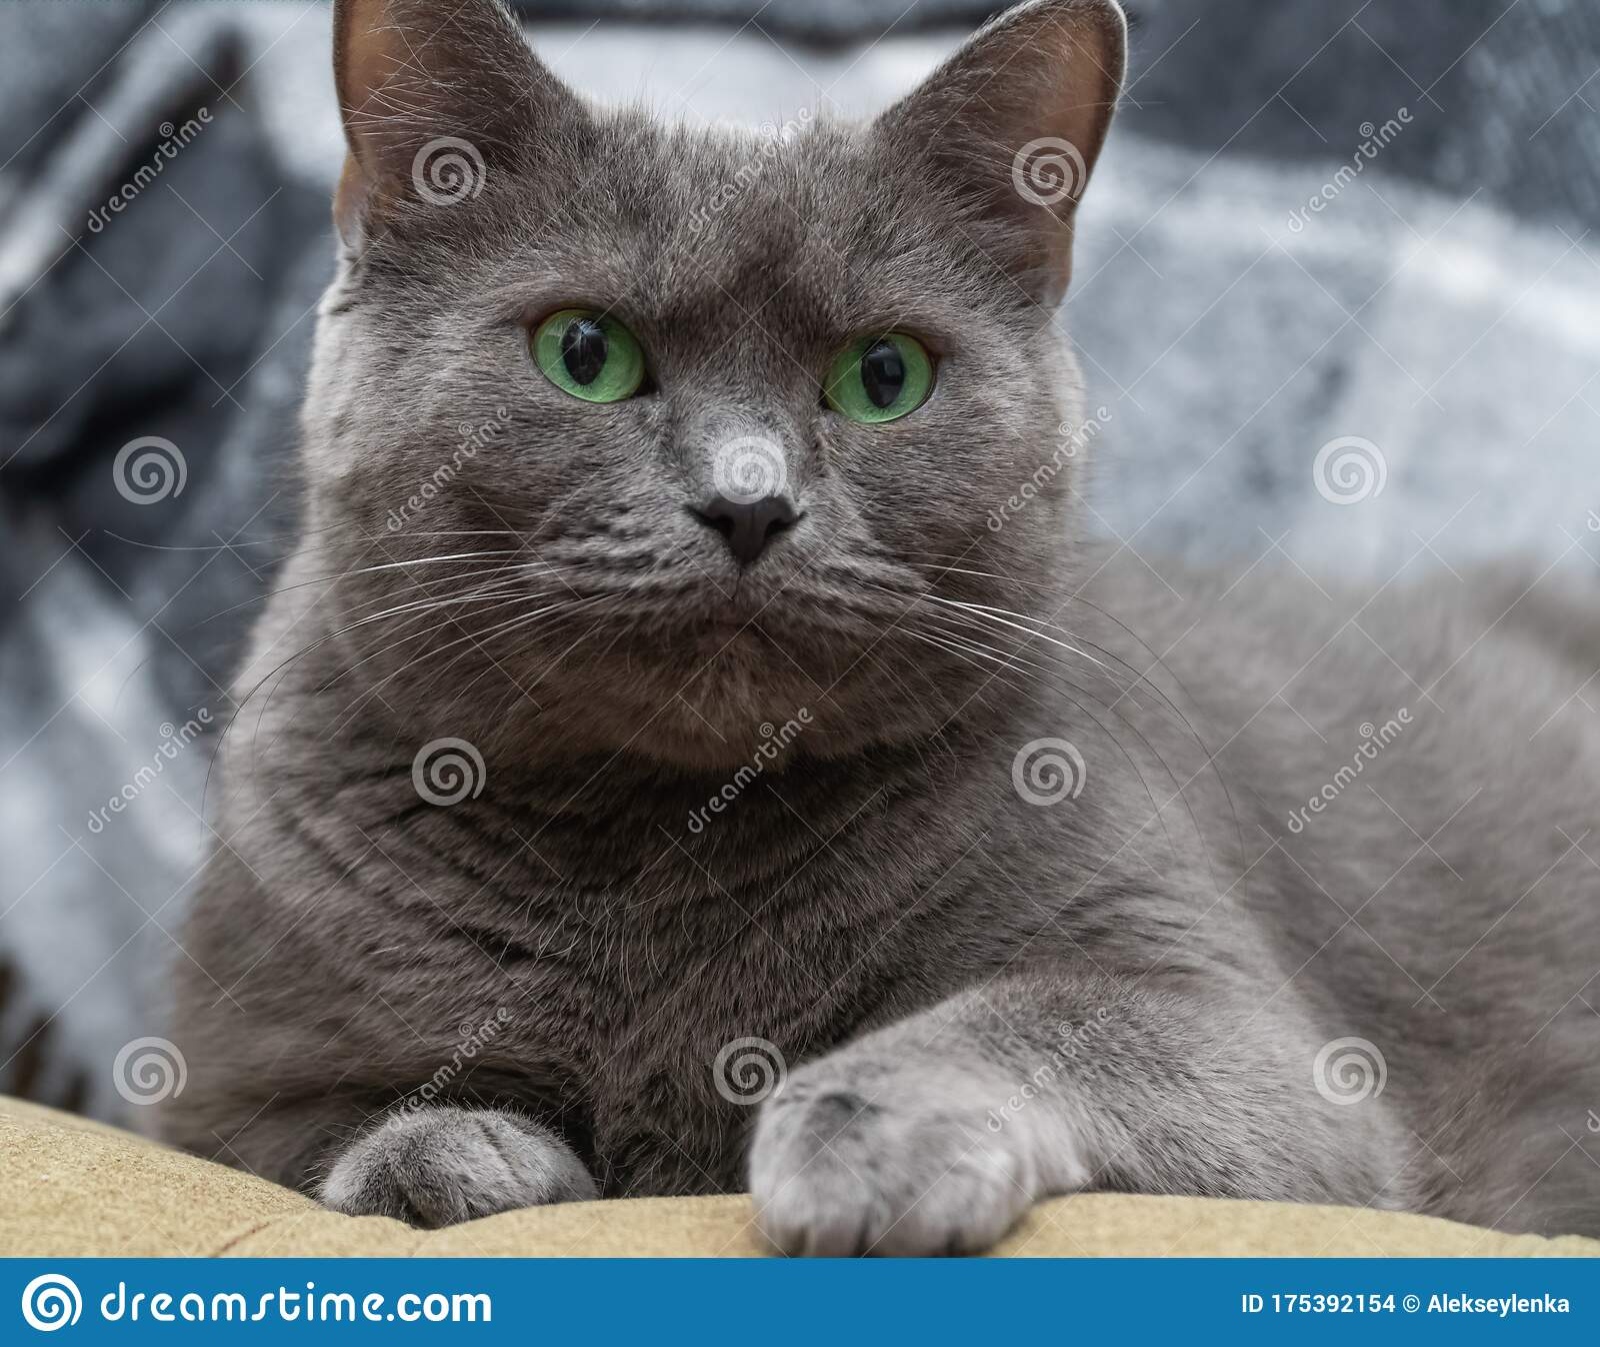 Russian Blue Cat On White Cat Russian Blue Sleepy Sweet Relax Portrait Pedigreed Isolated Portrait Studio Shot White Stock Photo Image Of Mammal Like 175392154